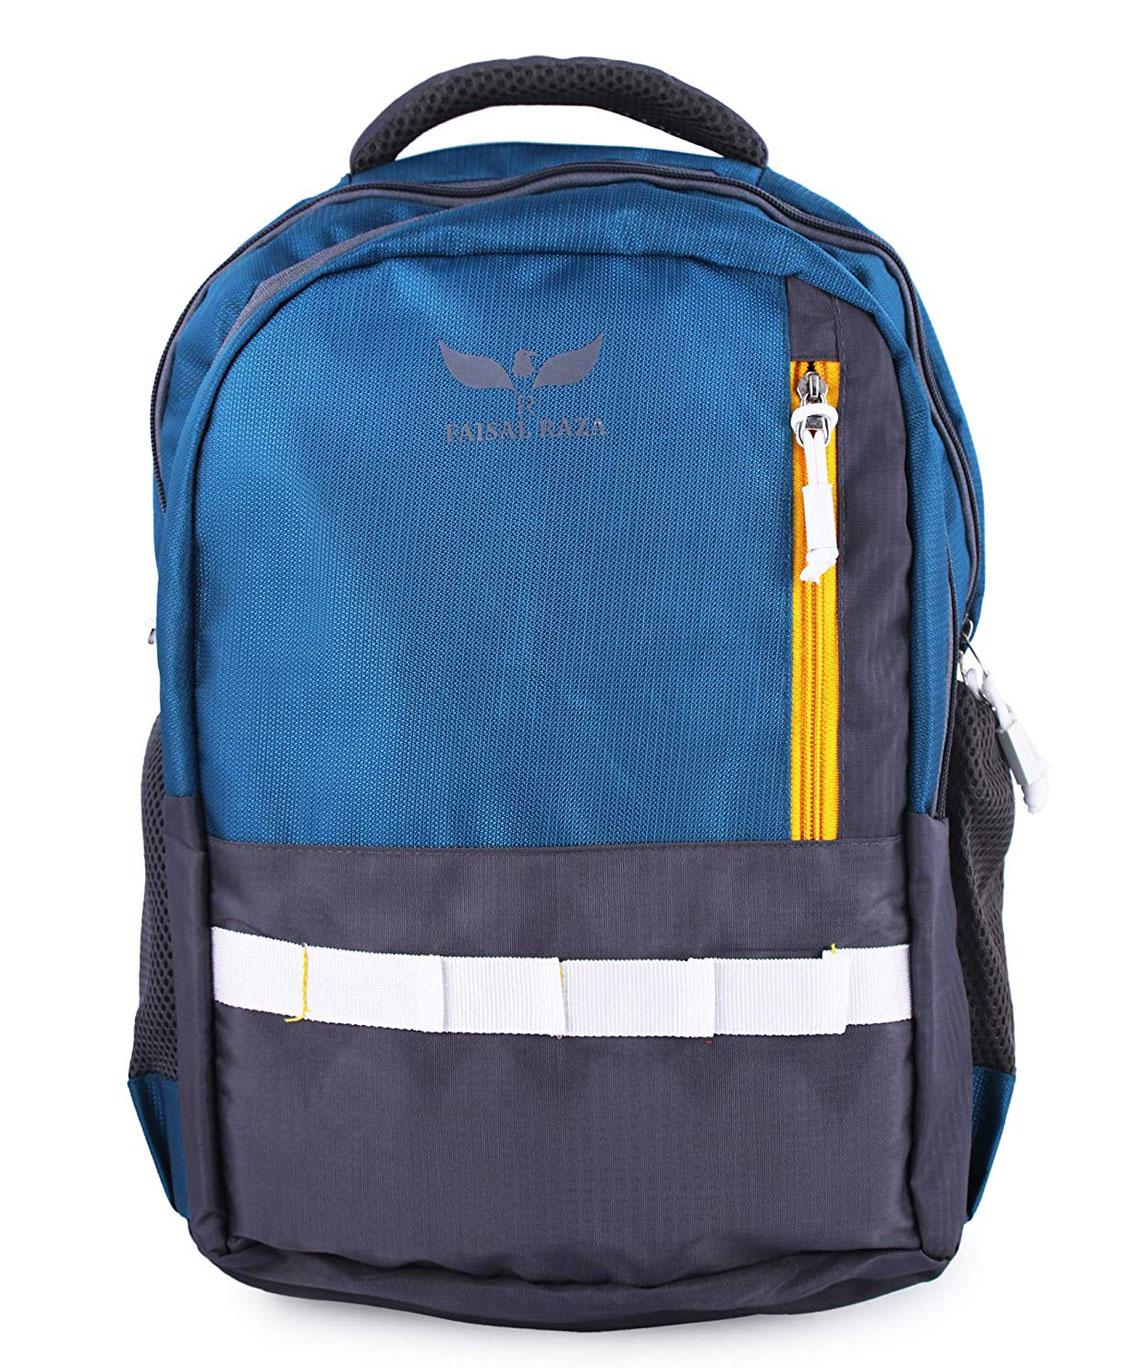 F/Star30 Liters Casual Bagpack/School Bag/Laptop Backpack(Multi)